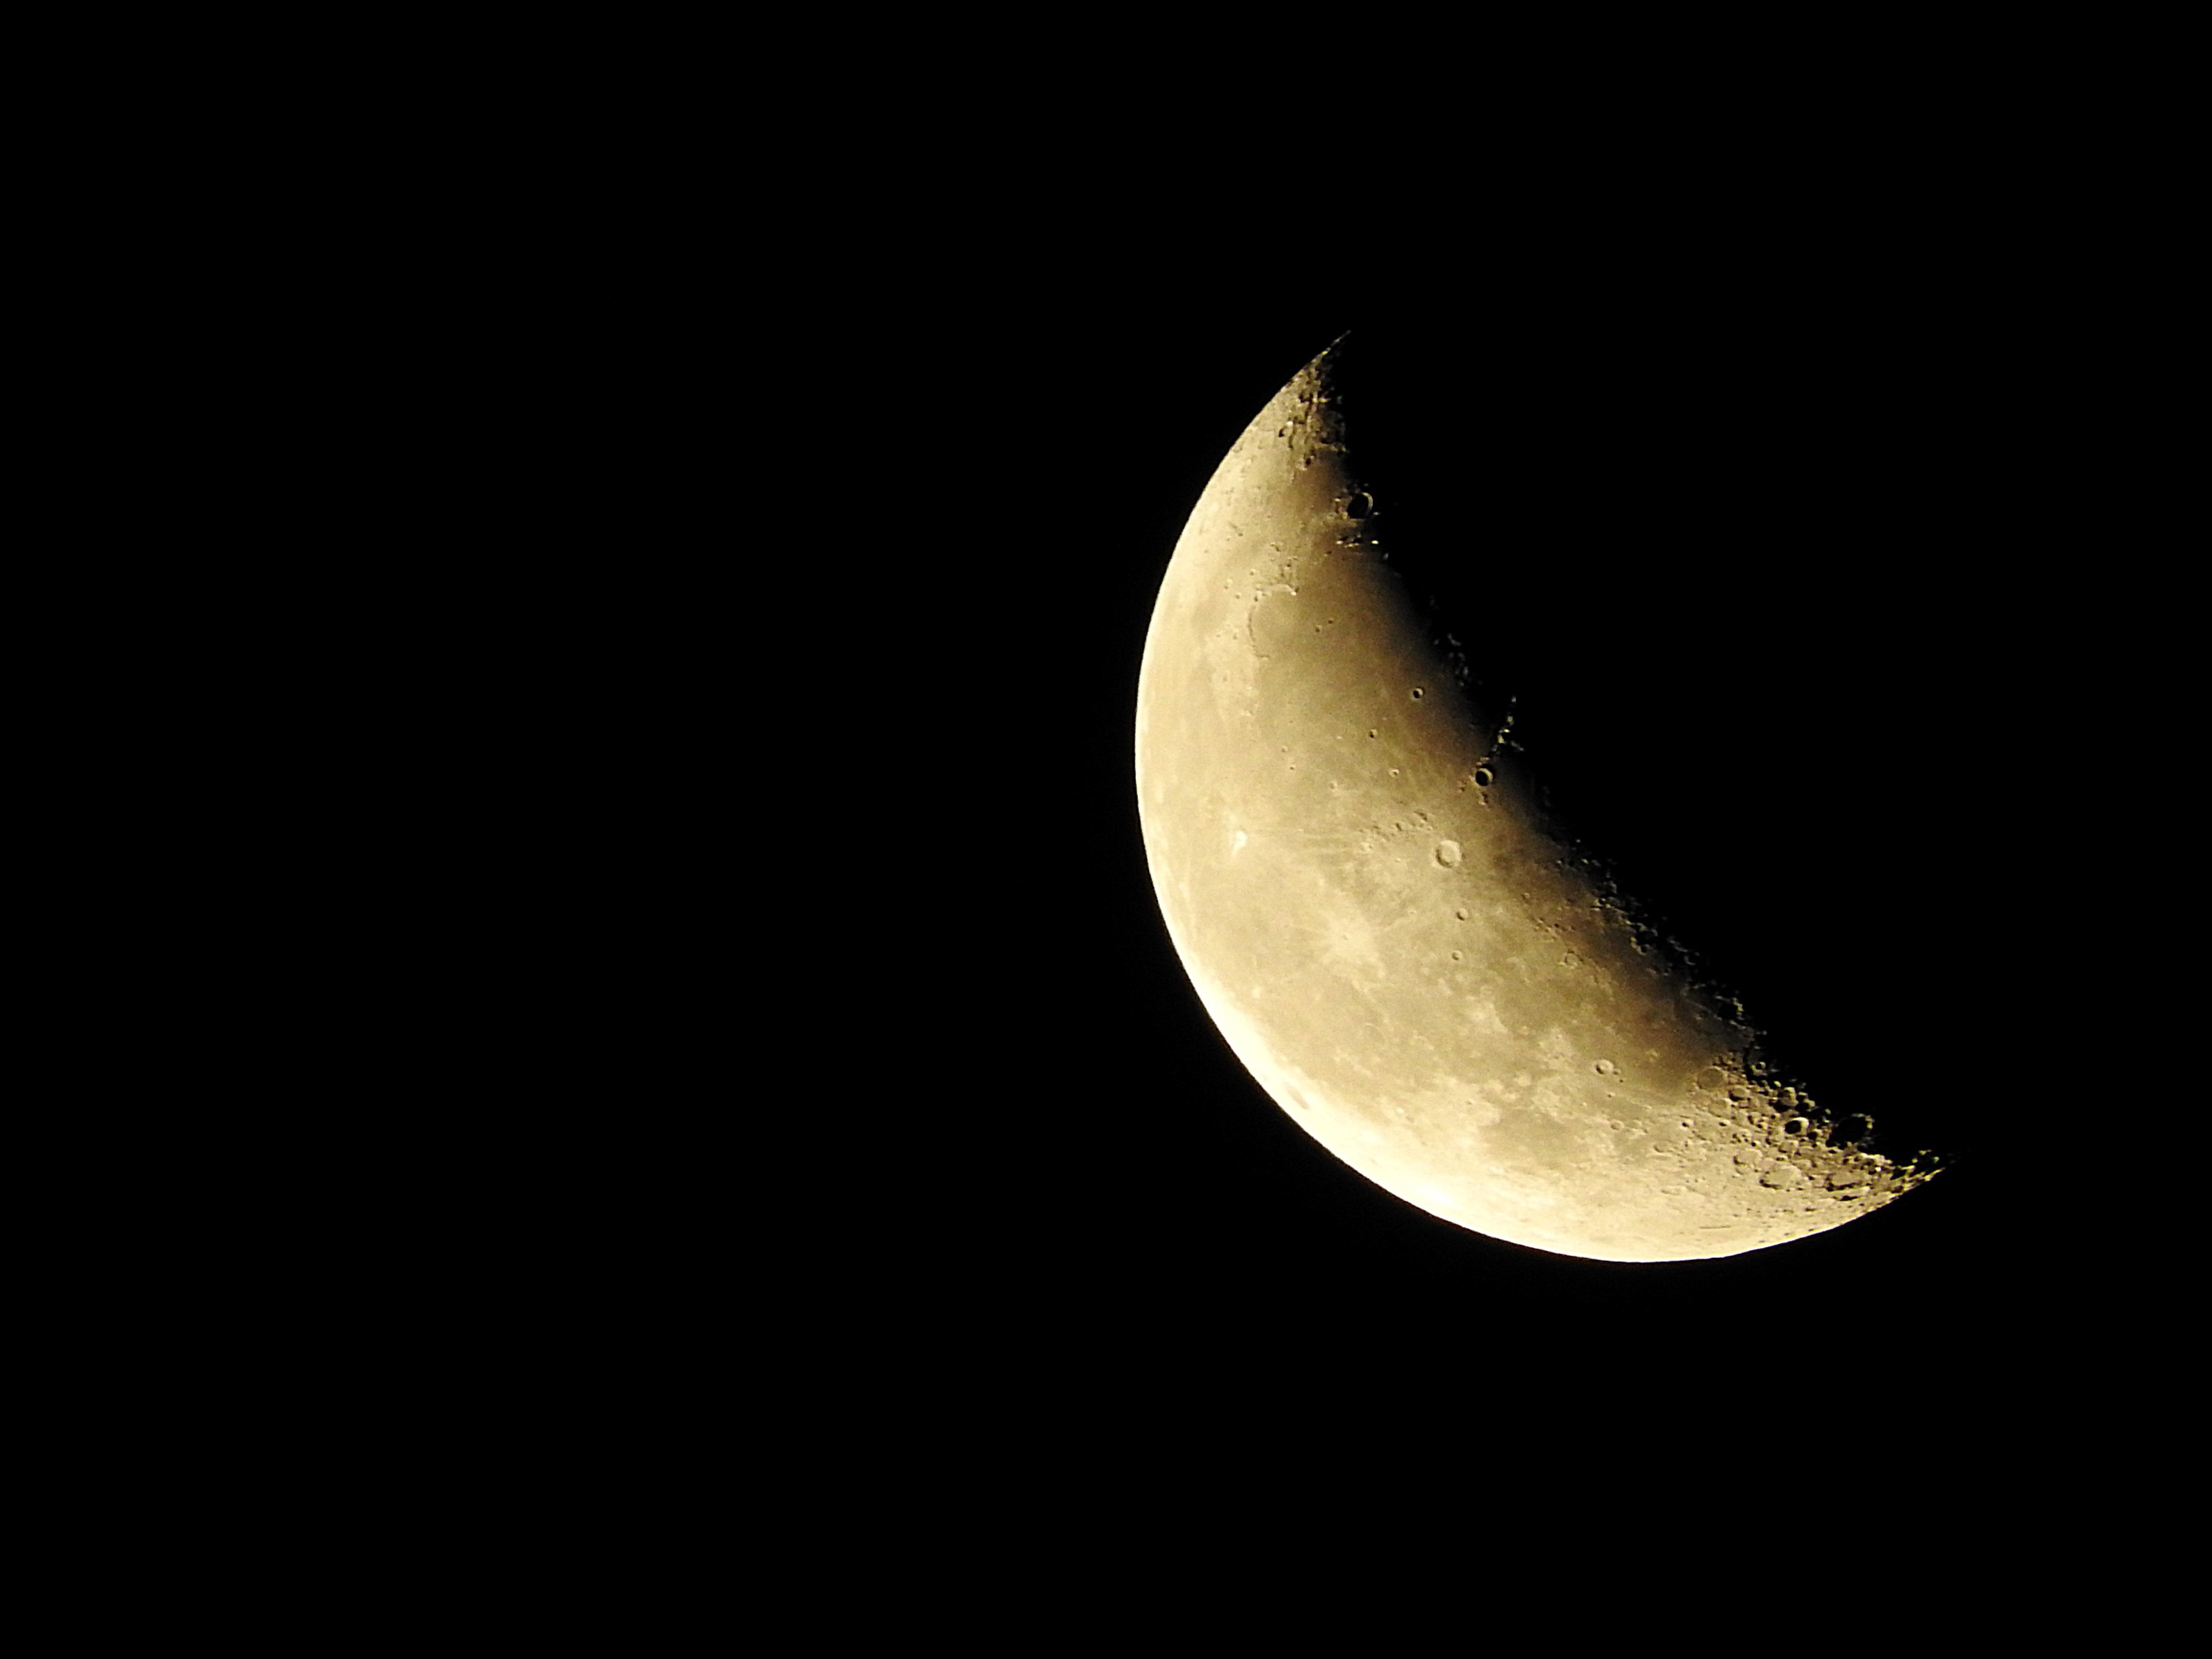 Gambar Suasana Lingkaran Bulan Sabit Objek Astronomi 4608x3456